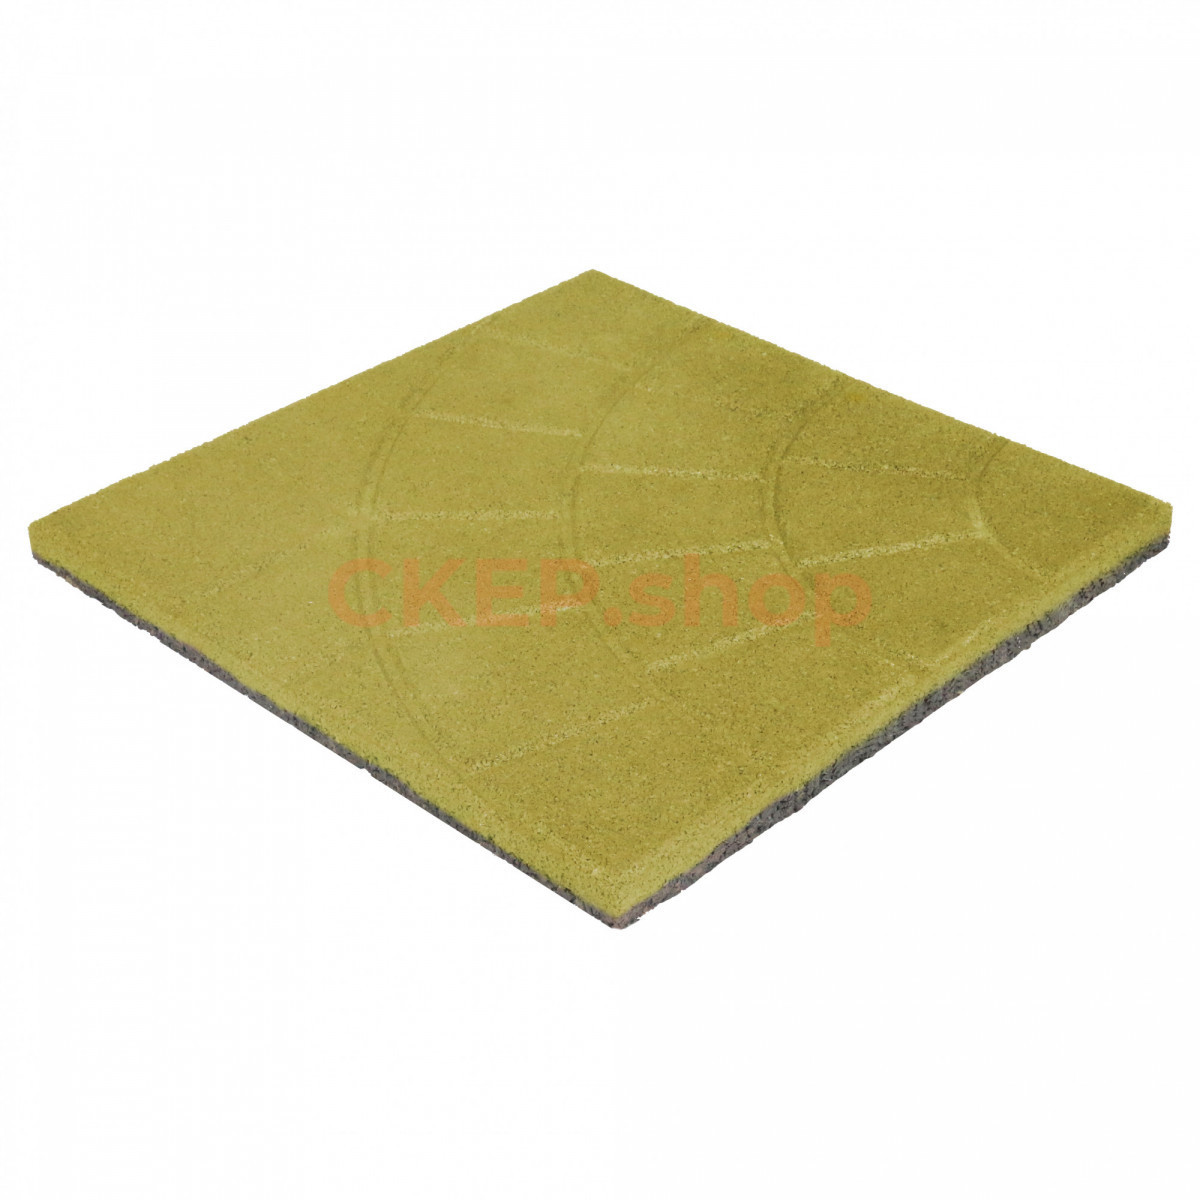 Резиновая плитка 350х350х30, паутинка, желтая